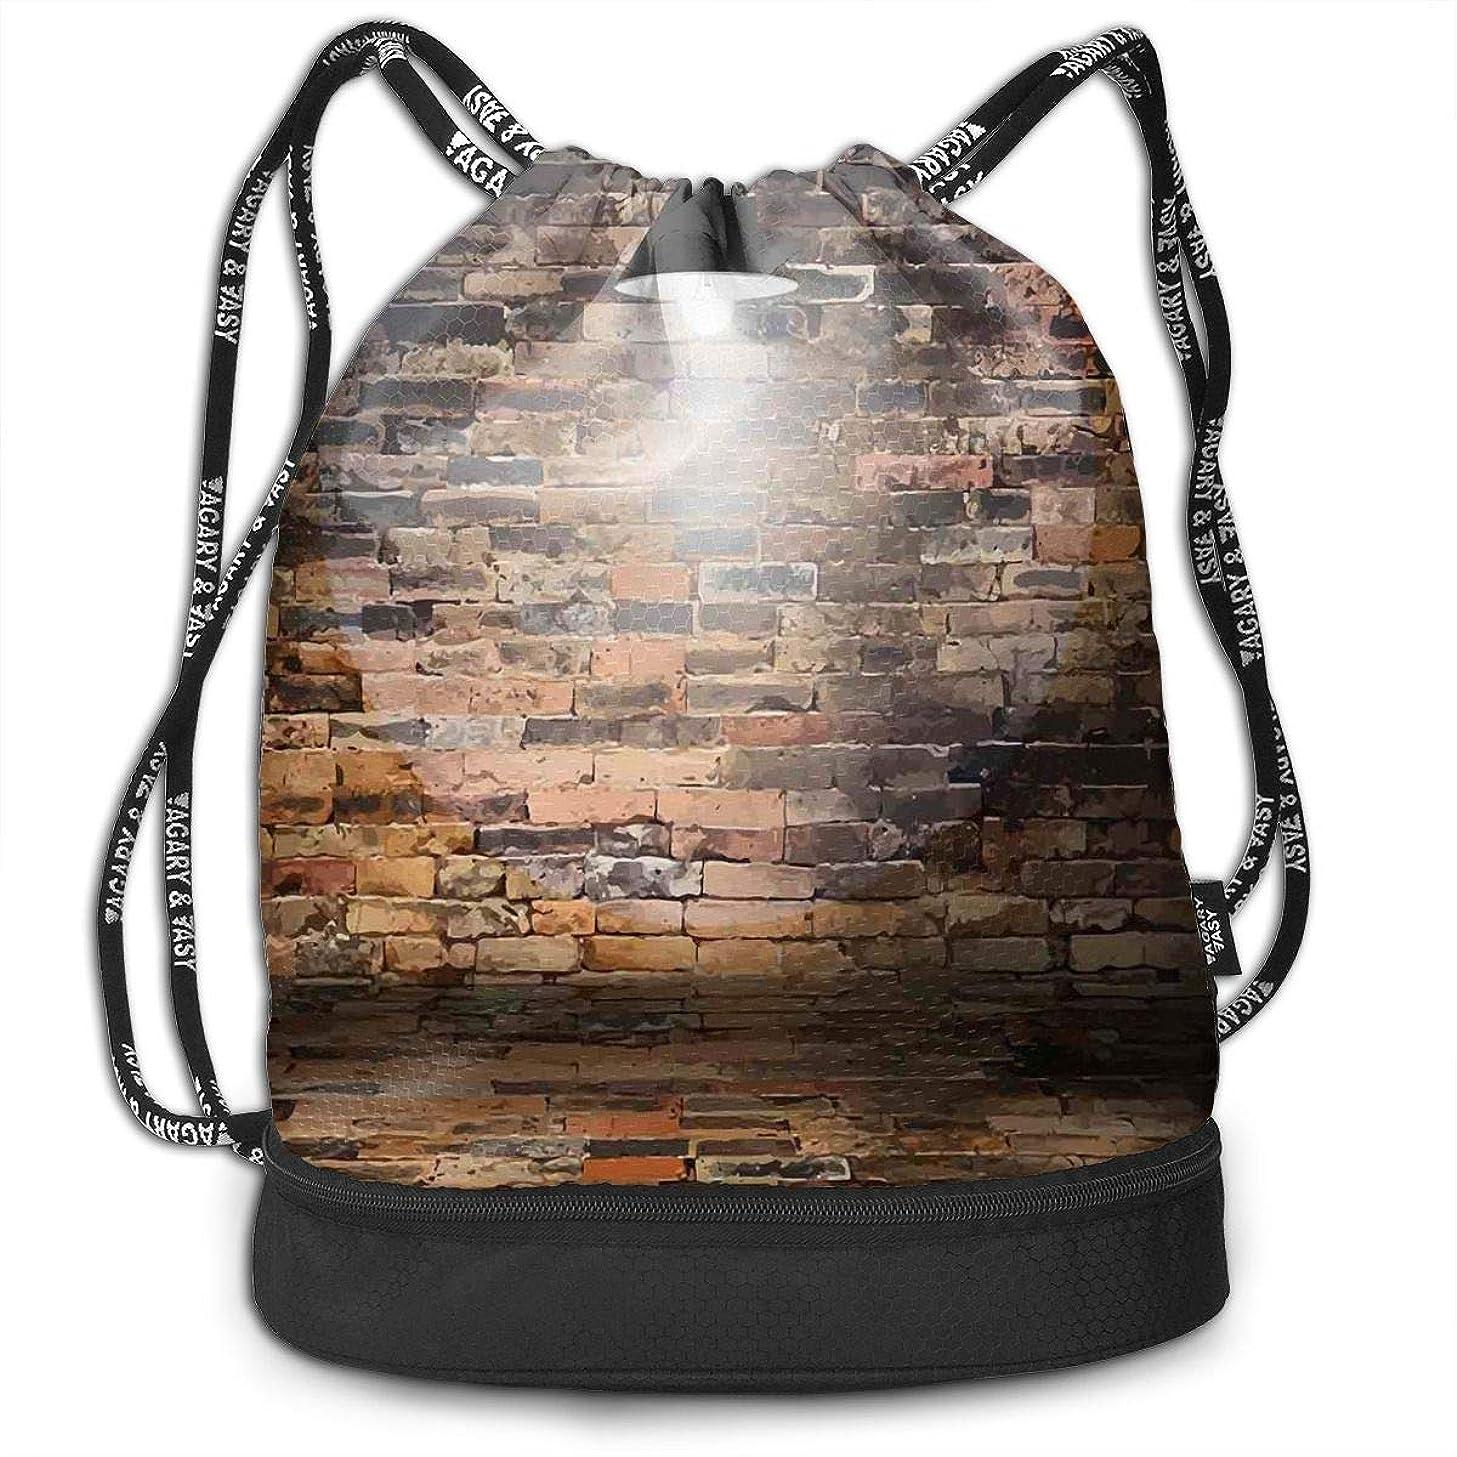 Drawstring Backpacks Bags,Dark Cracked Bricks Ceiling Lamp Spot Light Life Building Urban City Image,Adjustable